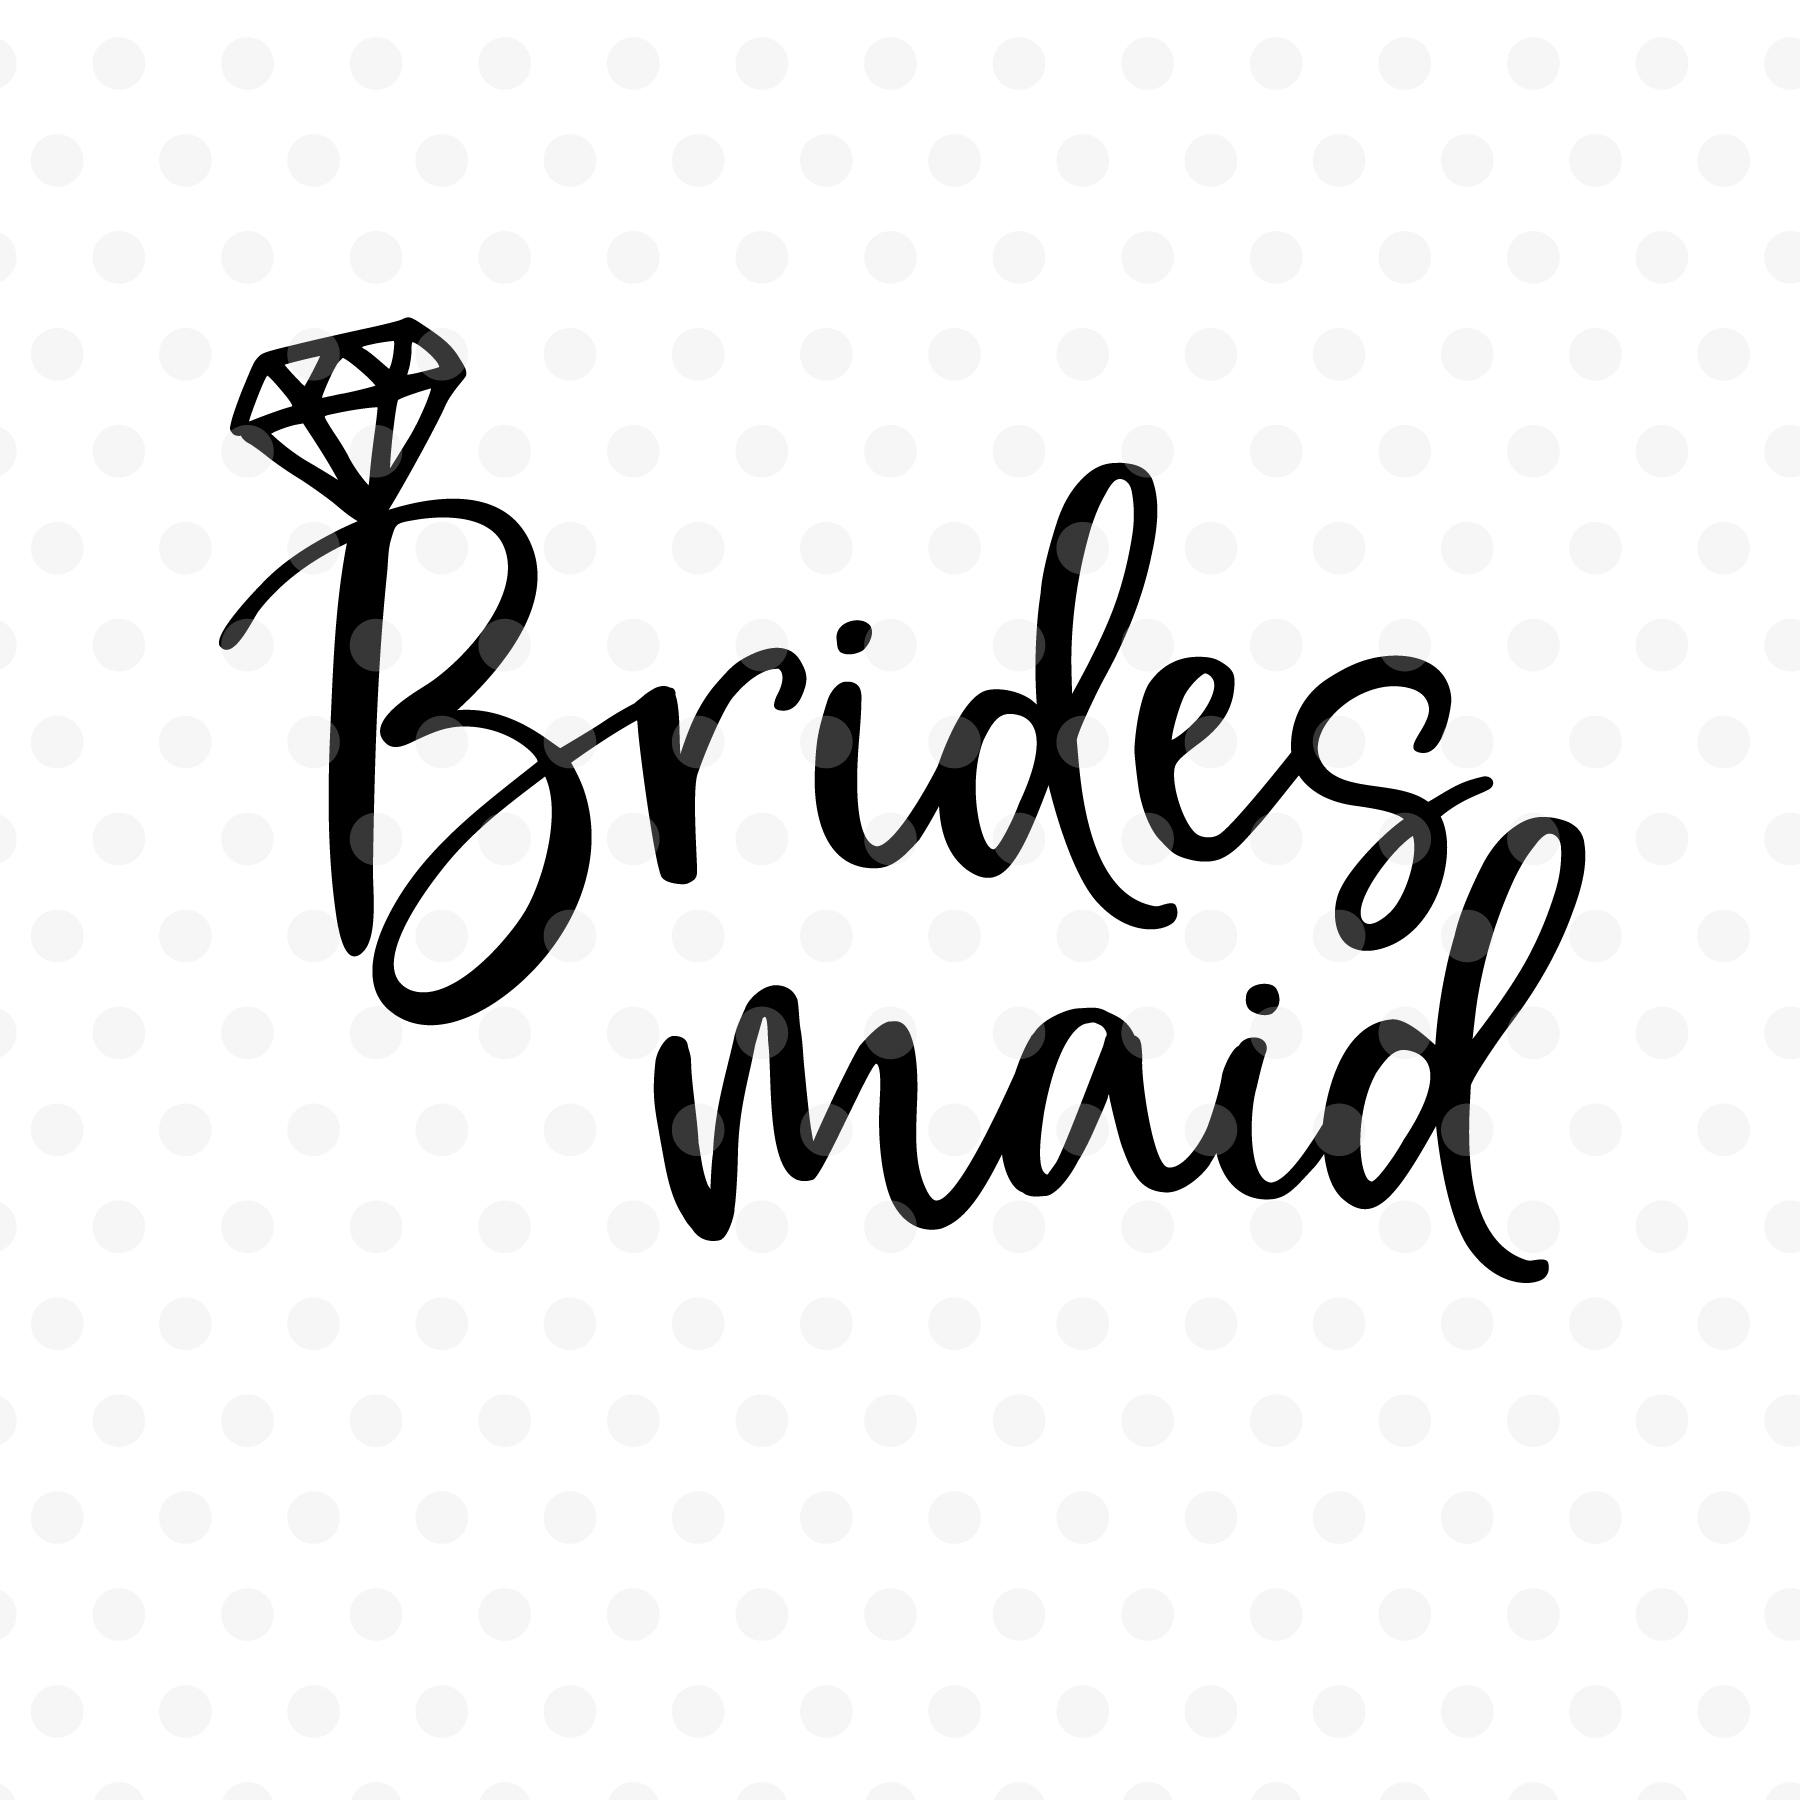 Bridesmaid wedding SVG, EPS, PNG, DXF.